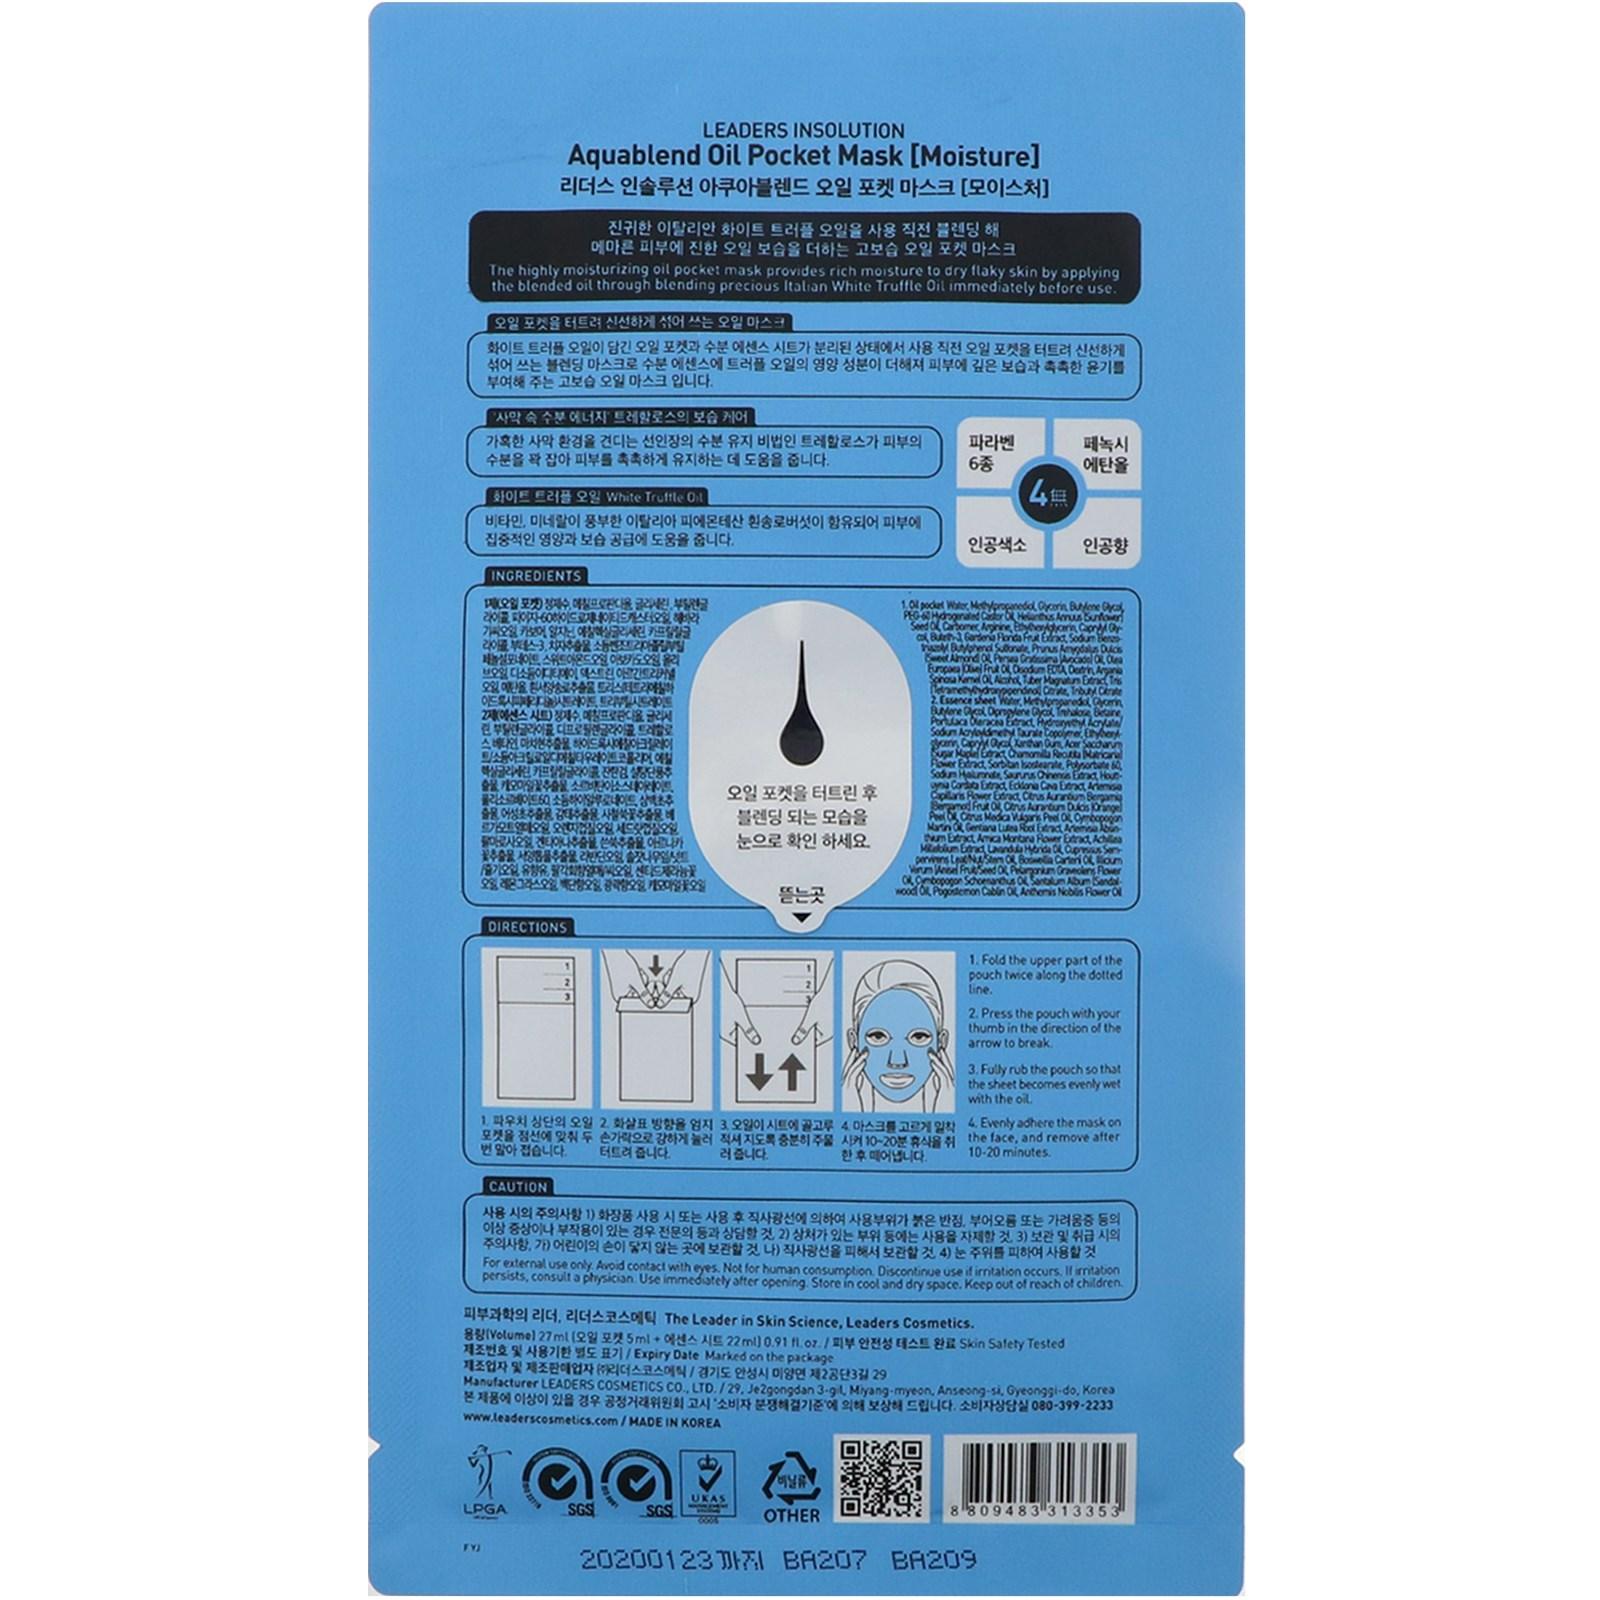 Leaders, Insolution, Aquablend Oil Pocket Mask, Nourishing, 1 Mask, 27 ml(pack of 6) Lancome  Renergie Eclat Multi Lift # 02